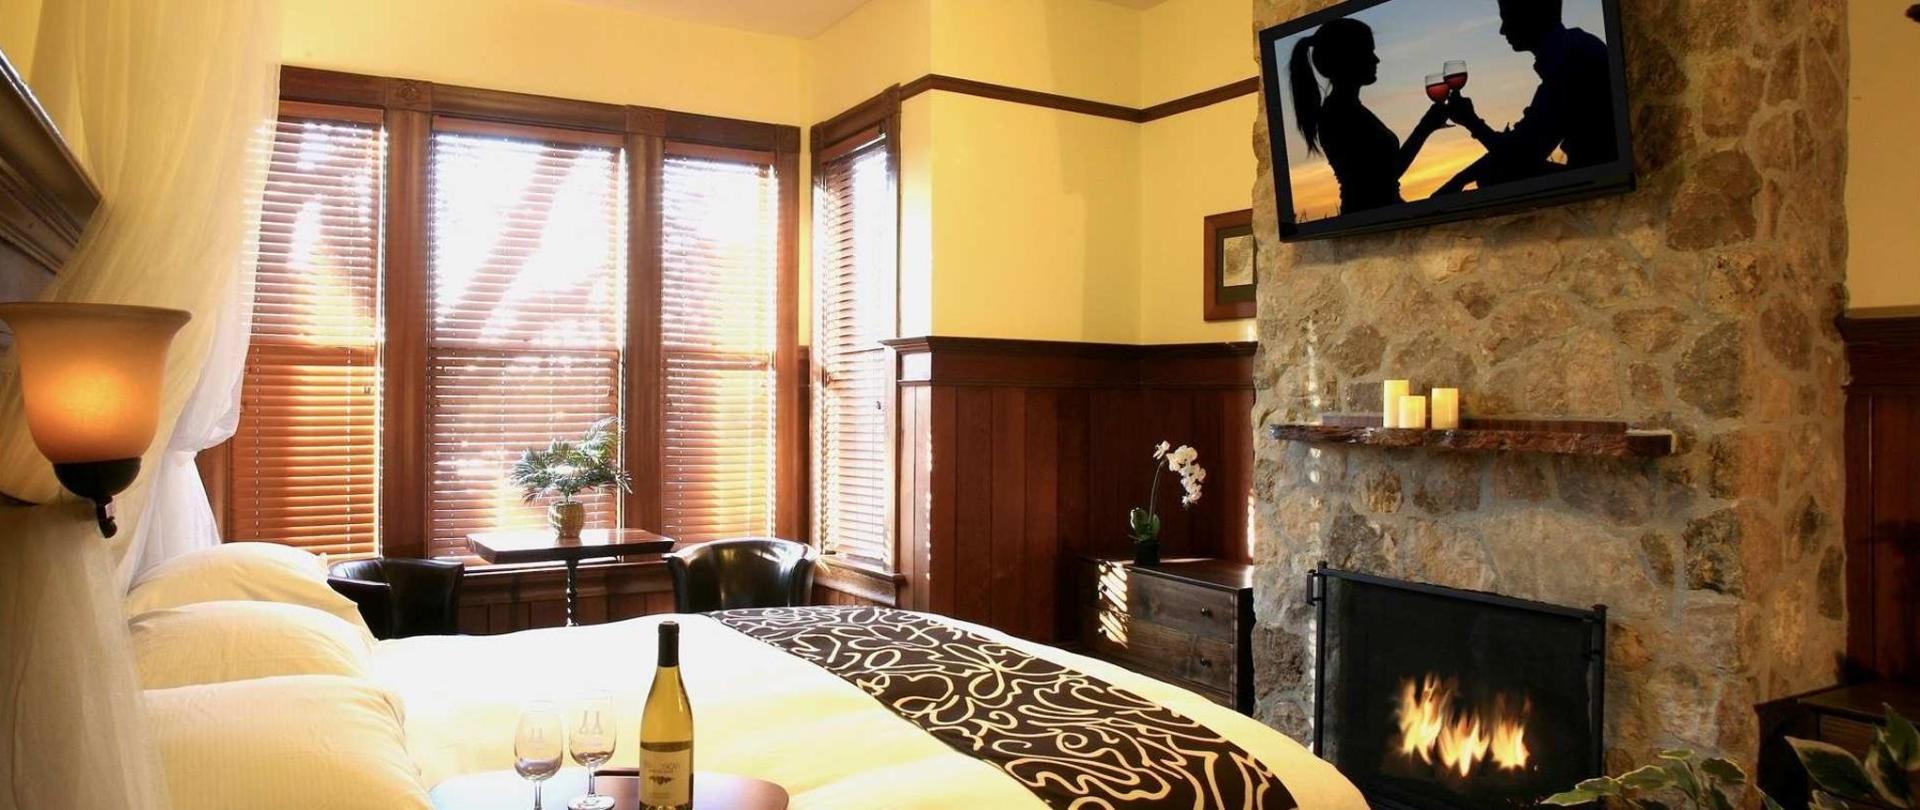 Hotel Napa Valley, an Old World Inn - Napa, CA - United States ...